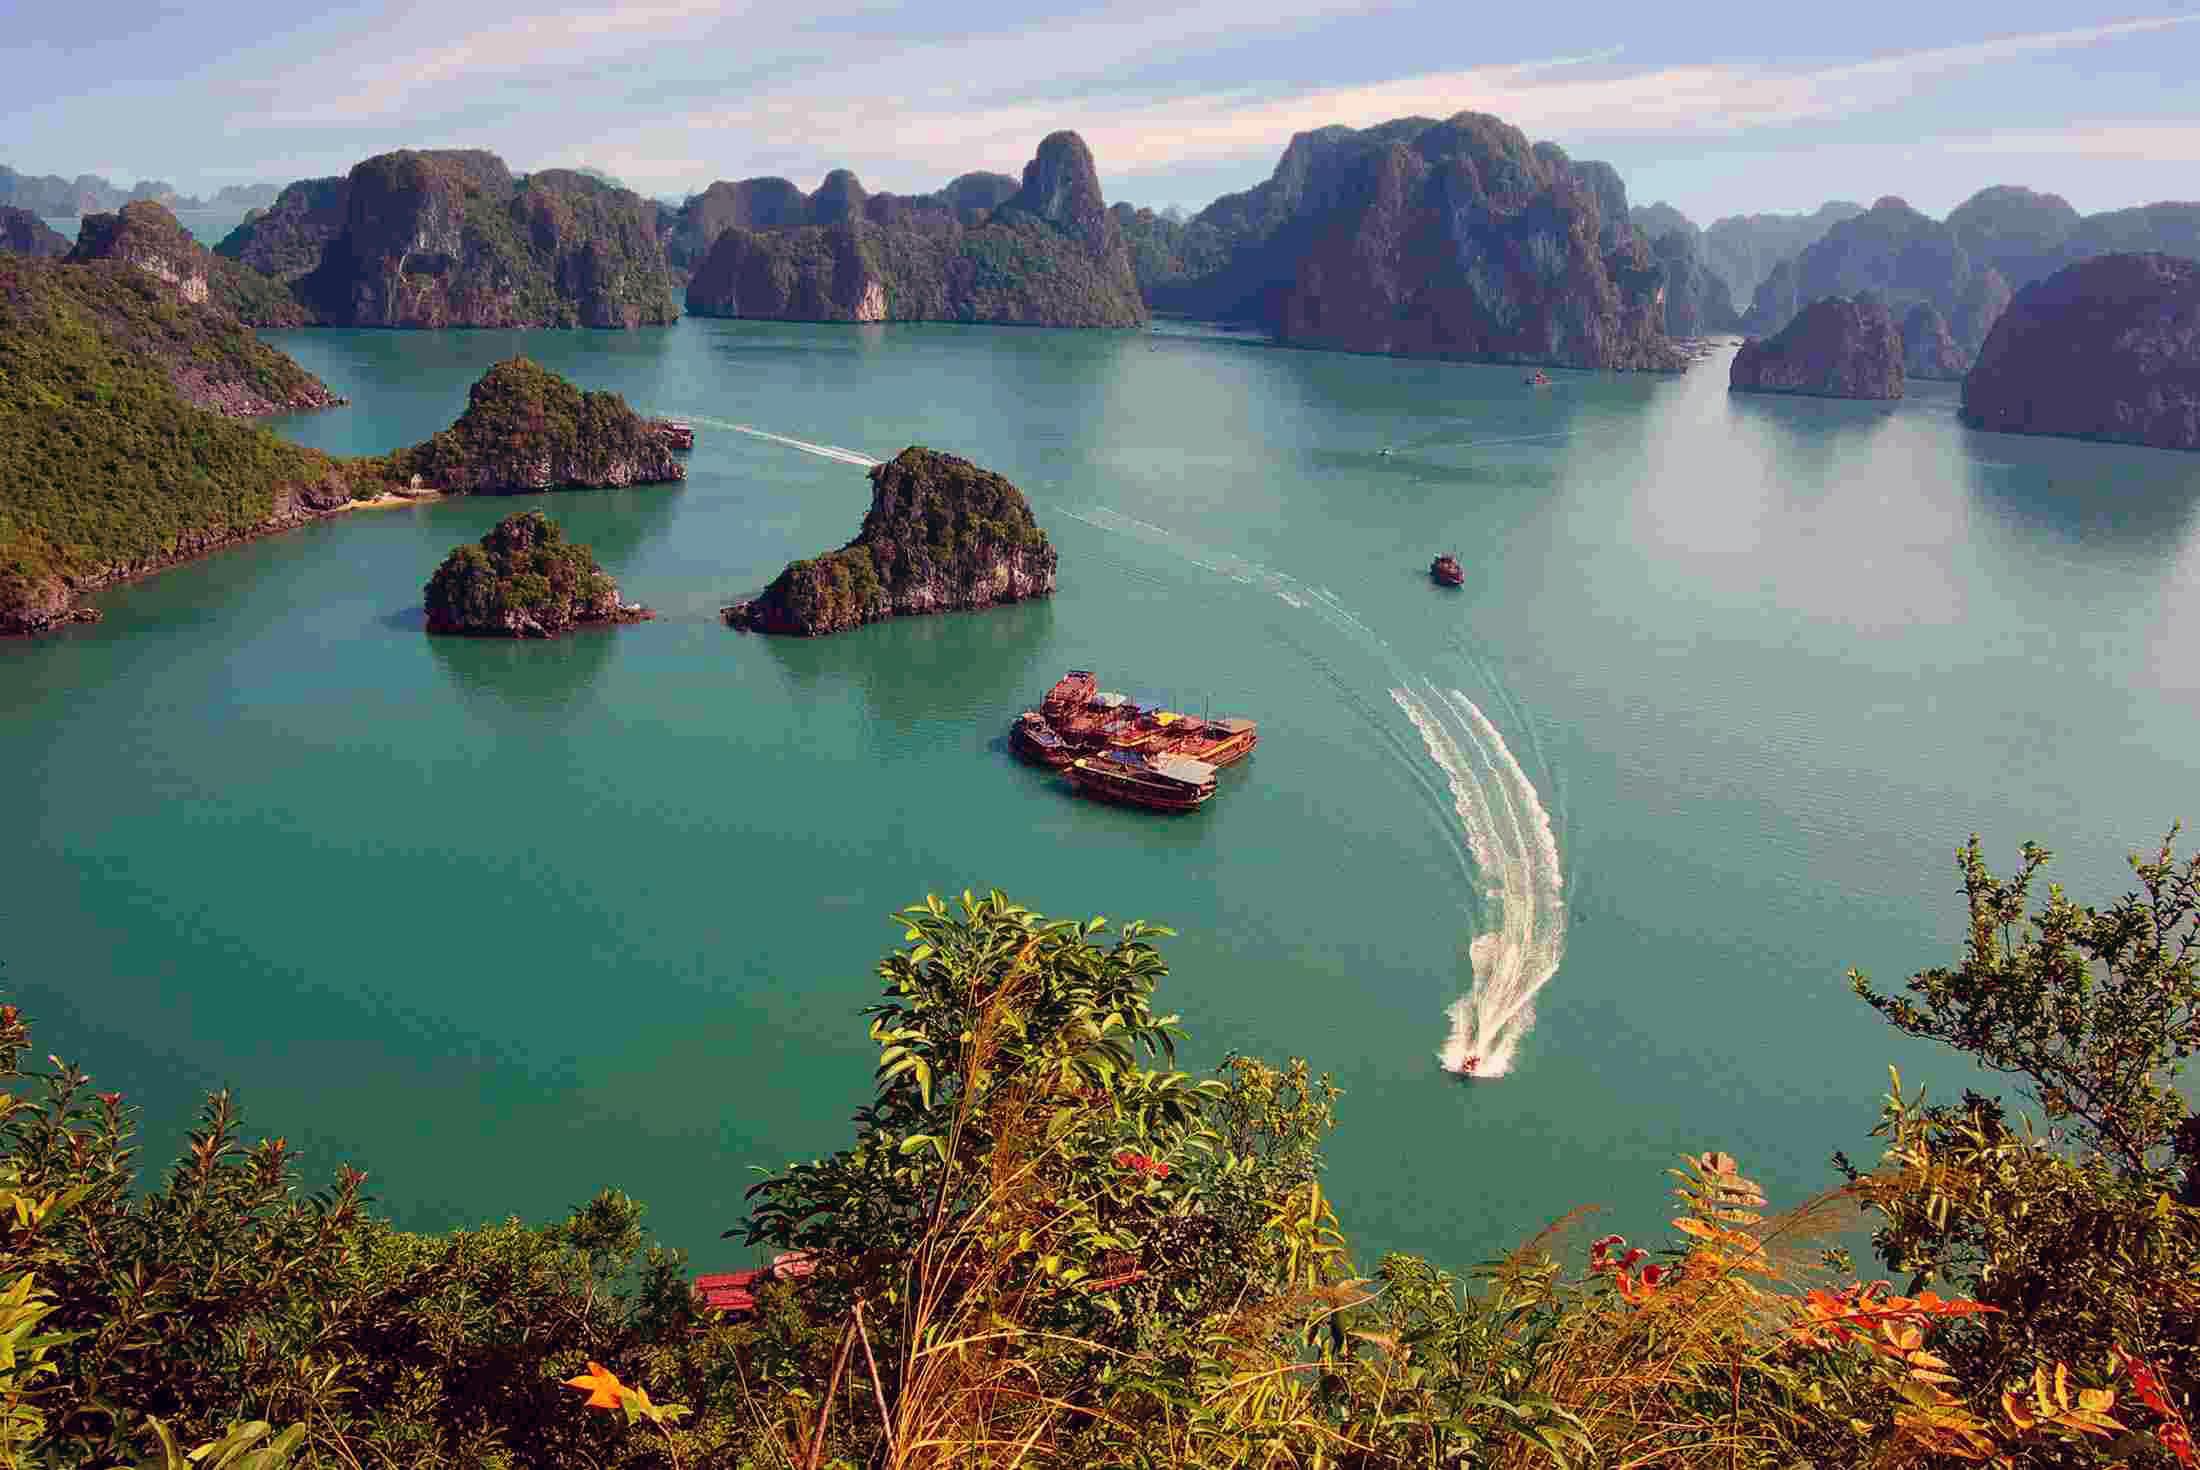 vietnam vizesi almak neden zor